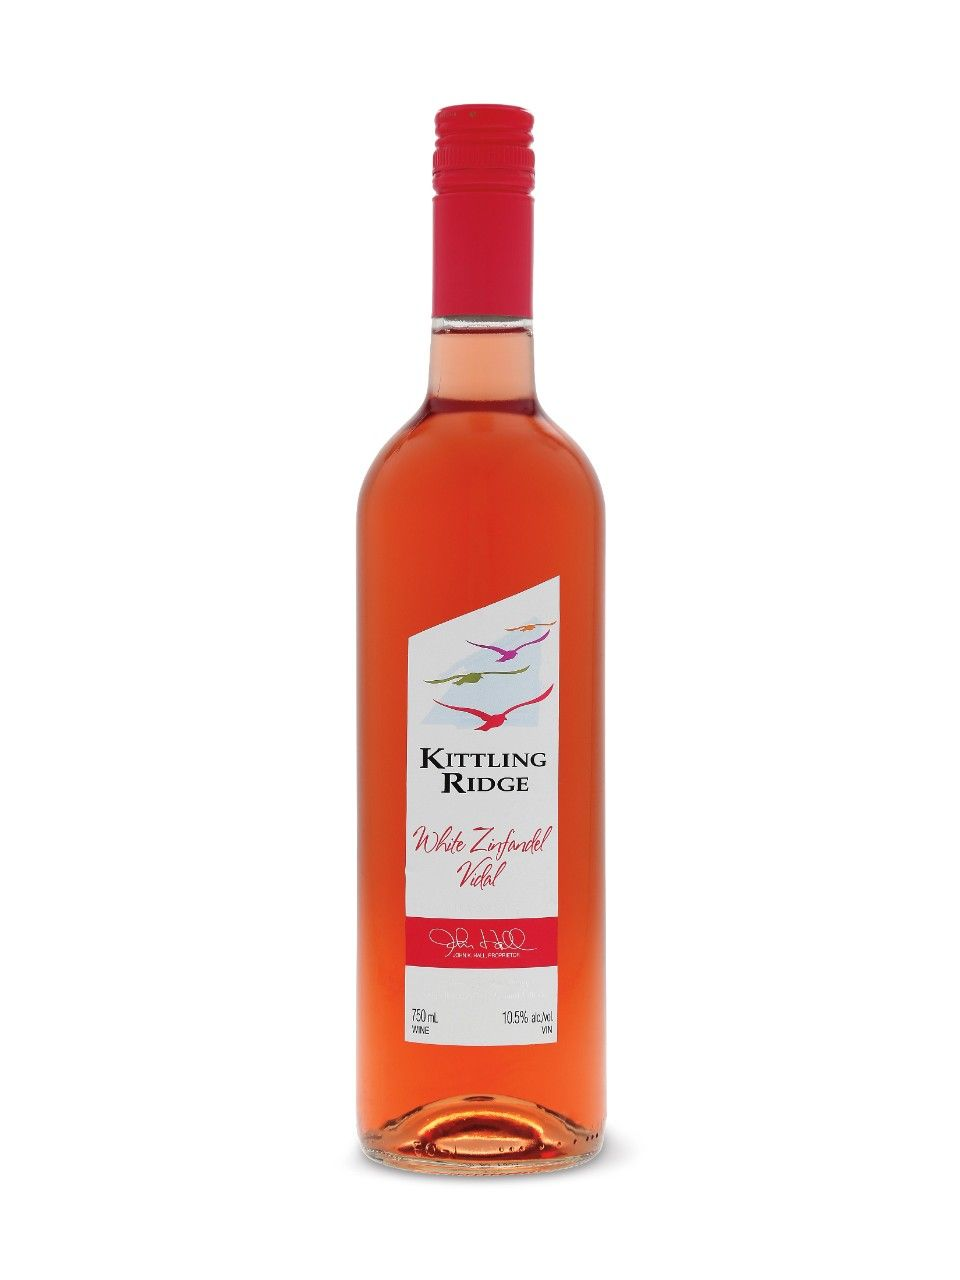 Kittling Ridge White Zinandel Vidal Pd White Zinfandel Wine Bottle Alcoholic Drinks